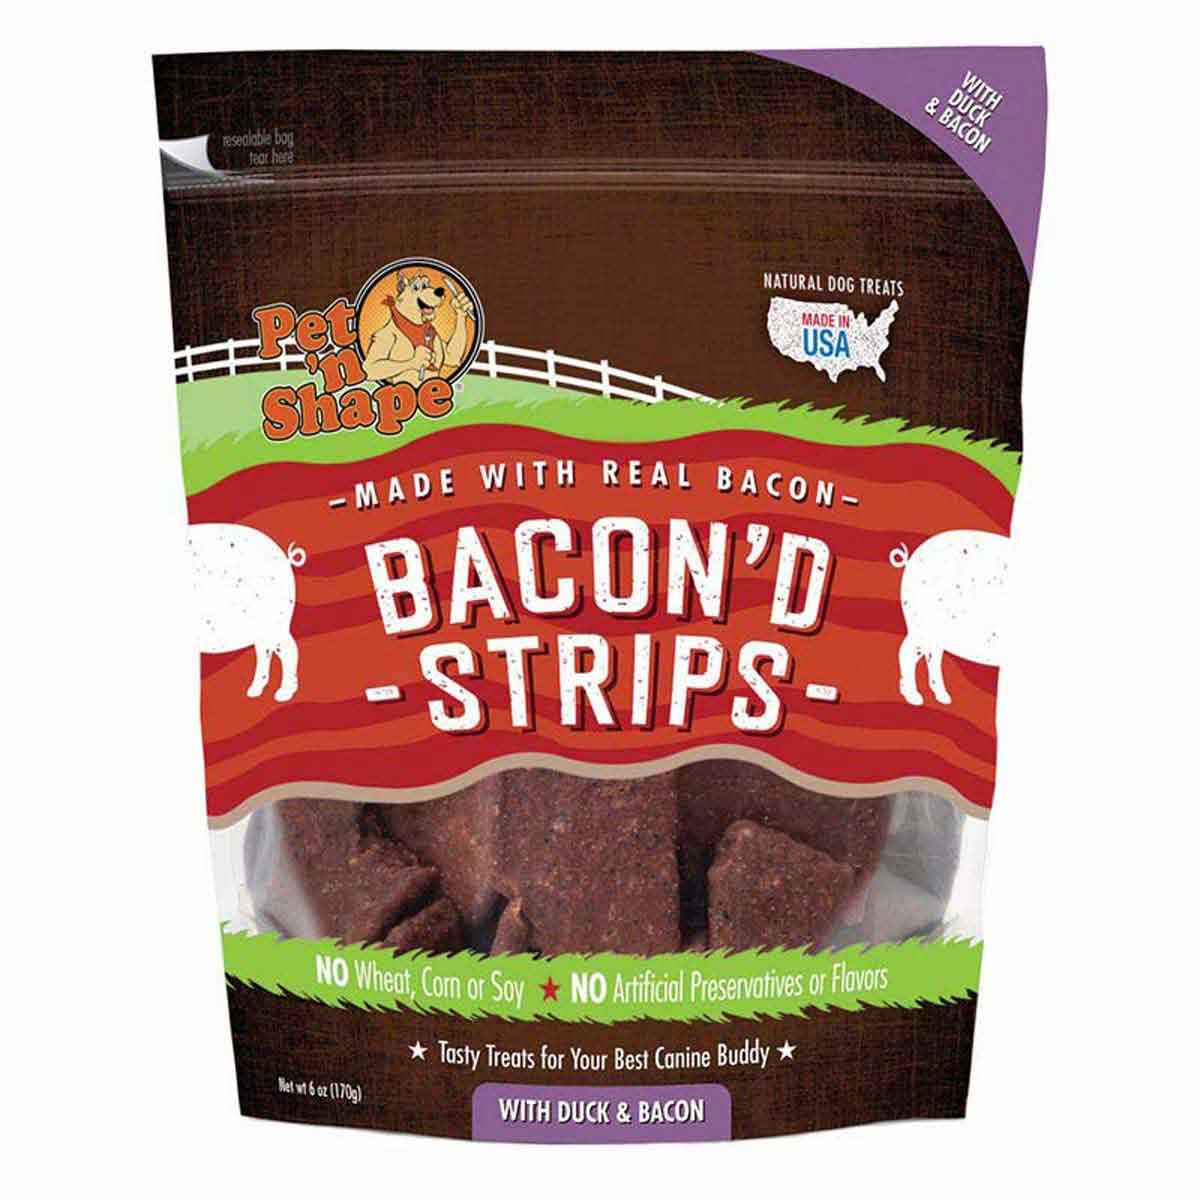 Pet 'n Shape Duck & Bacon Bacon'd Strips Treats for Dog 6 oz Bag